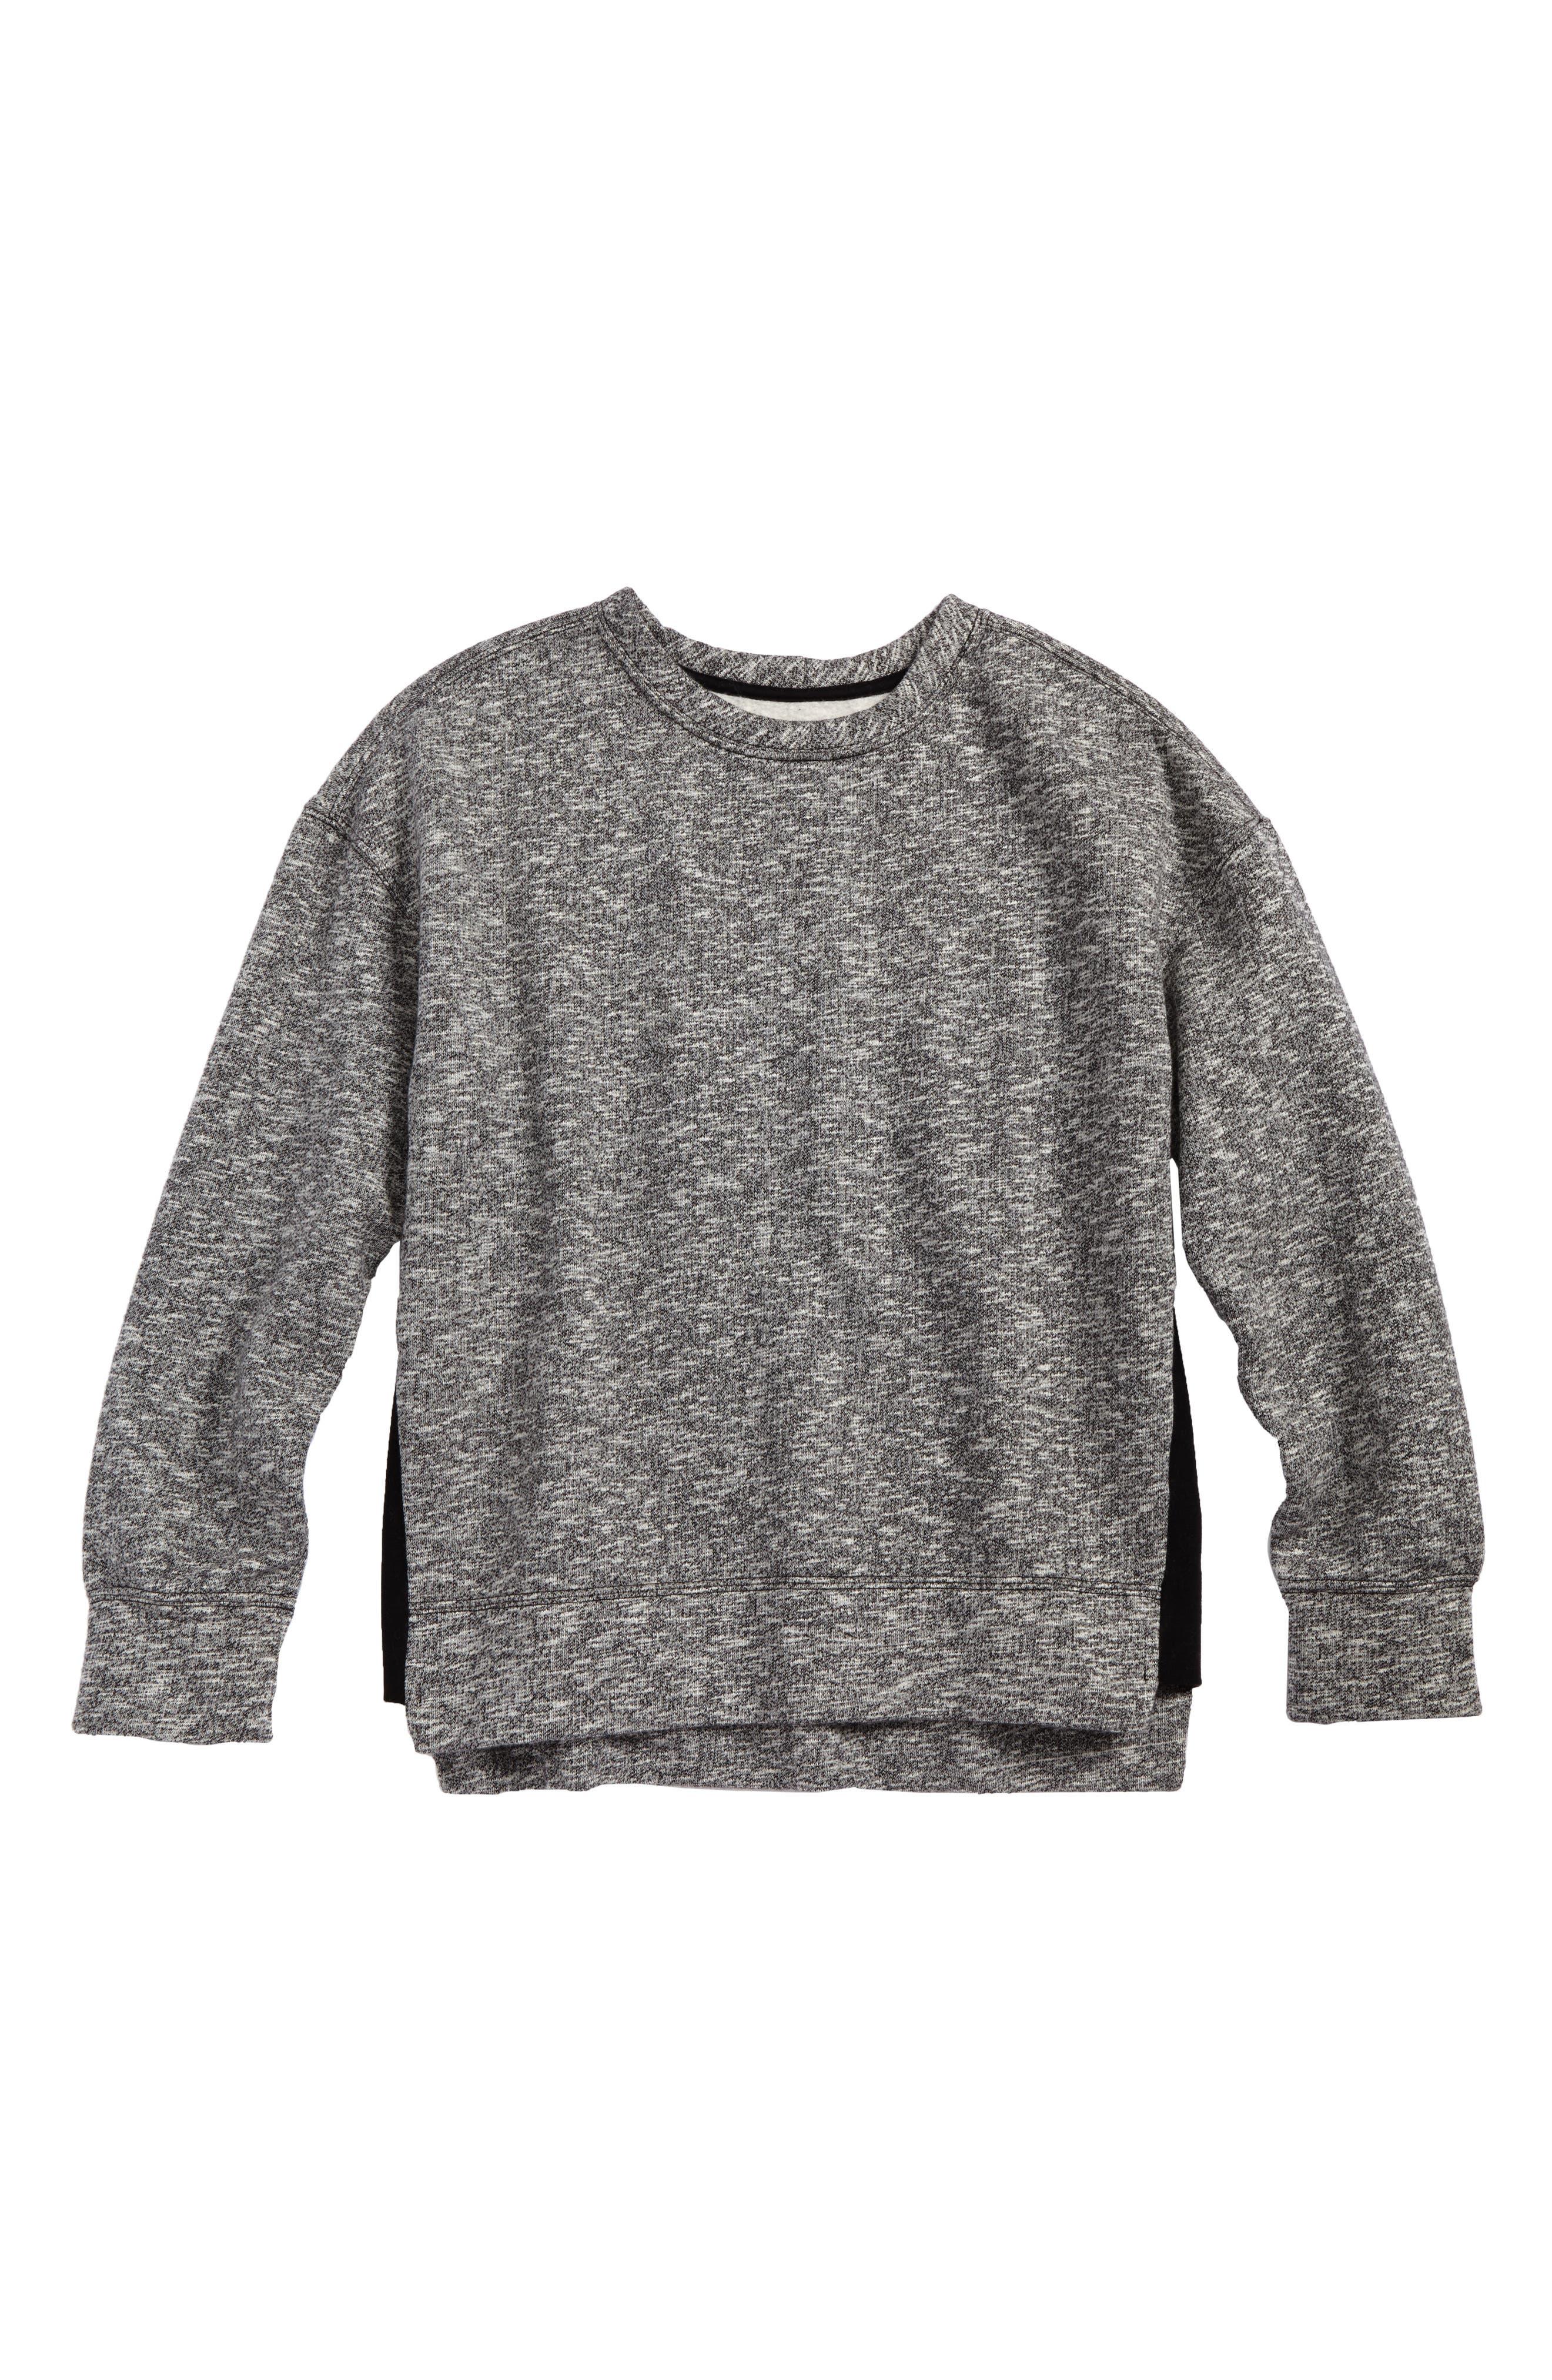 High/Low Sweatshirt,                         Main,                         color, 020